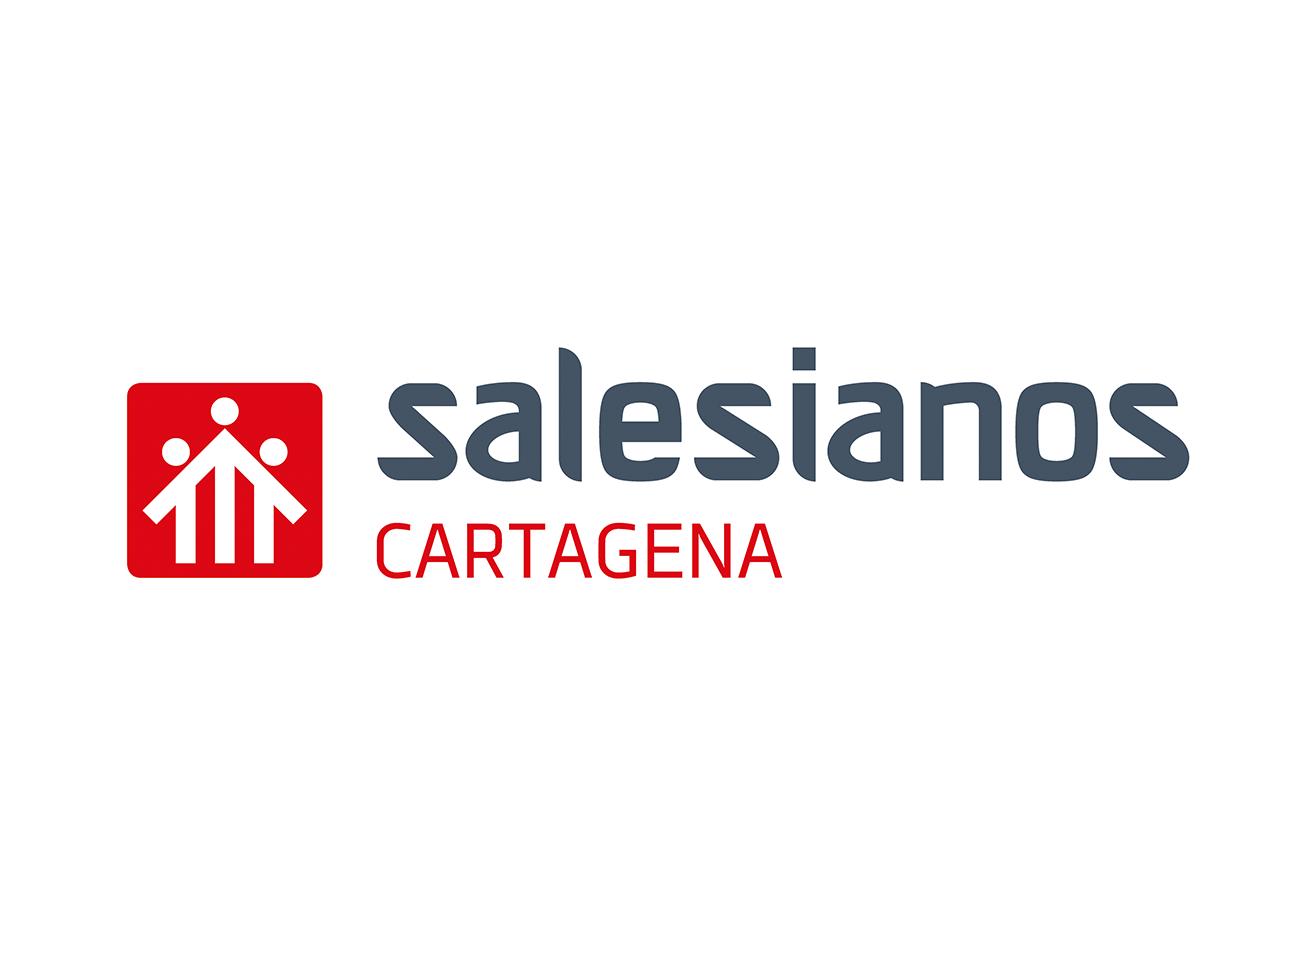 Salesiano Cartagena